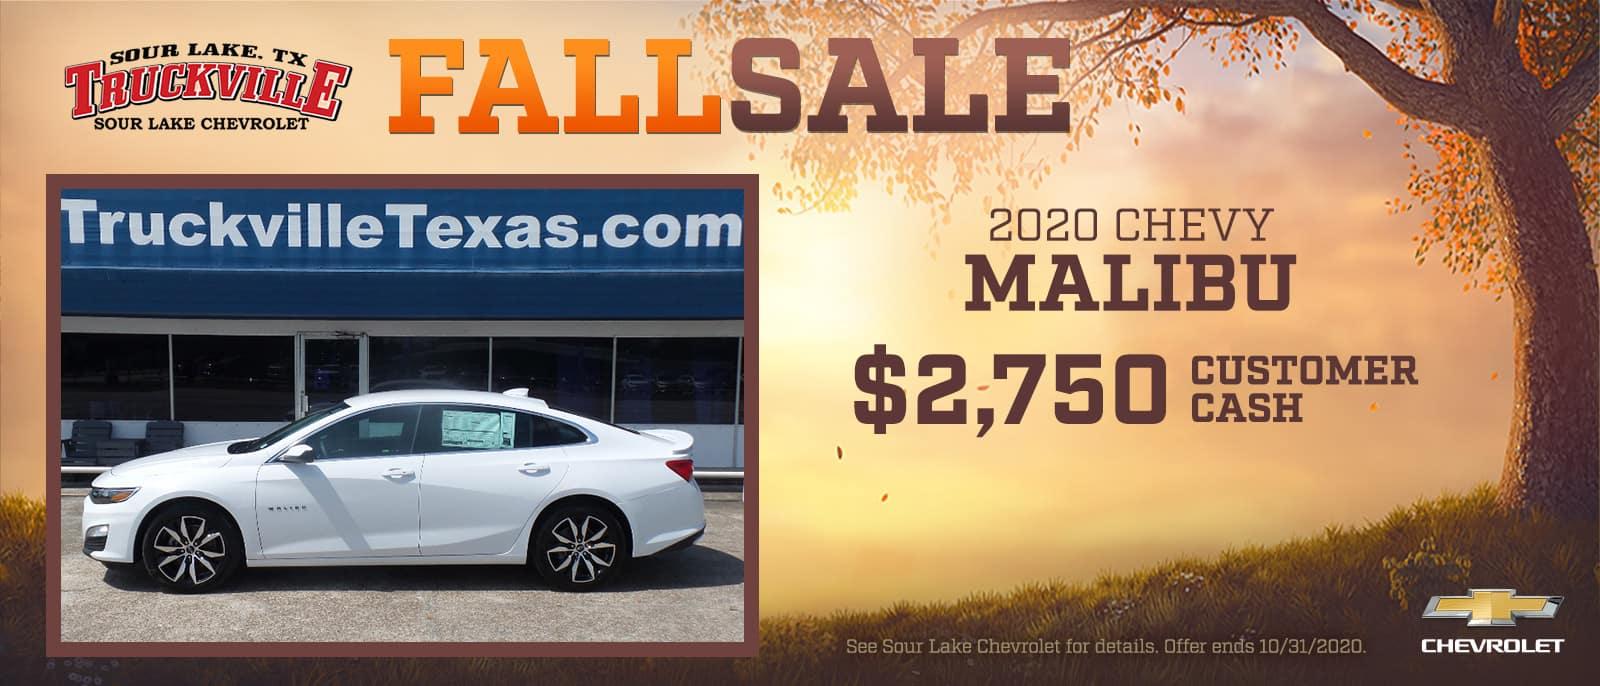 2020 Chevrolet Malibu Fall Sale Event | Sour Lake, TX